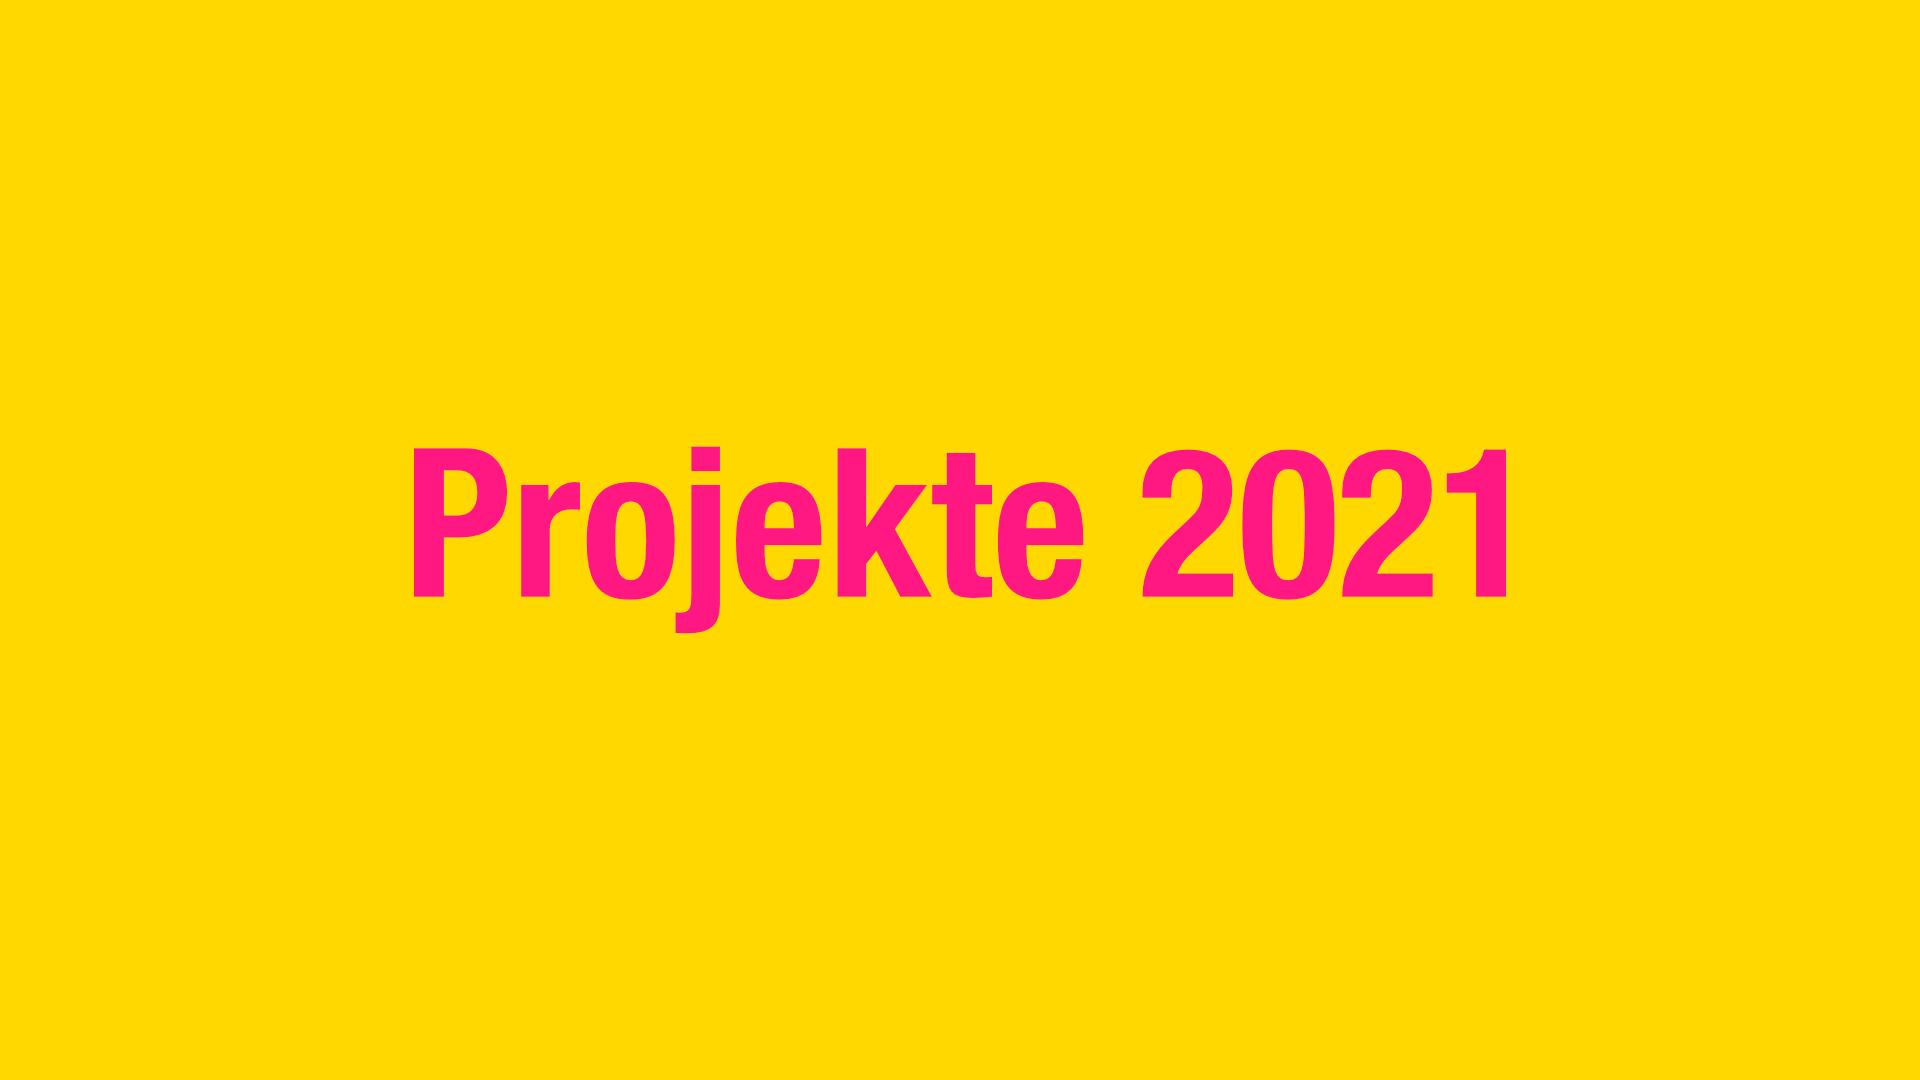 Projekte 2021